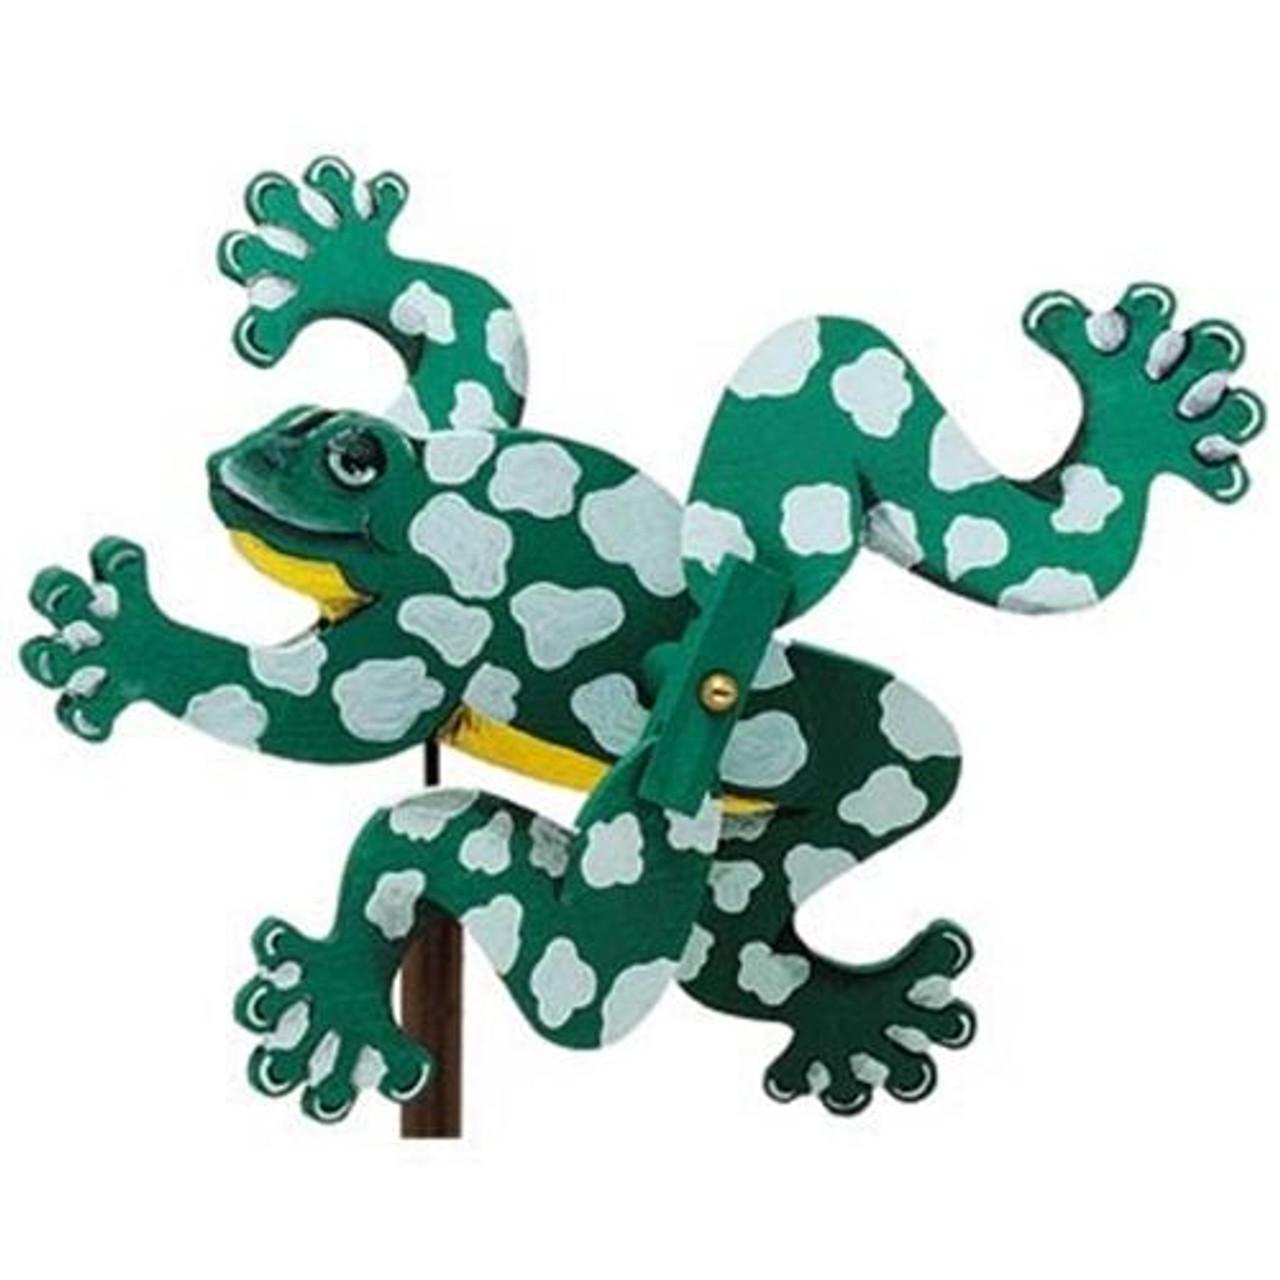 Cherry Tree Toys Frog Whirligig DIY Kit